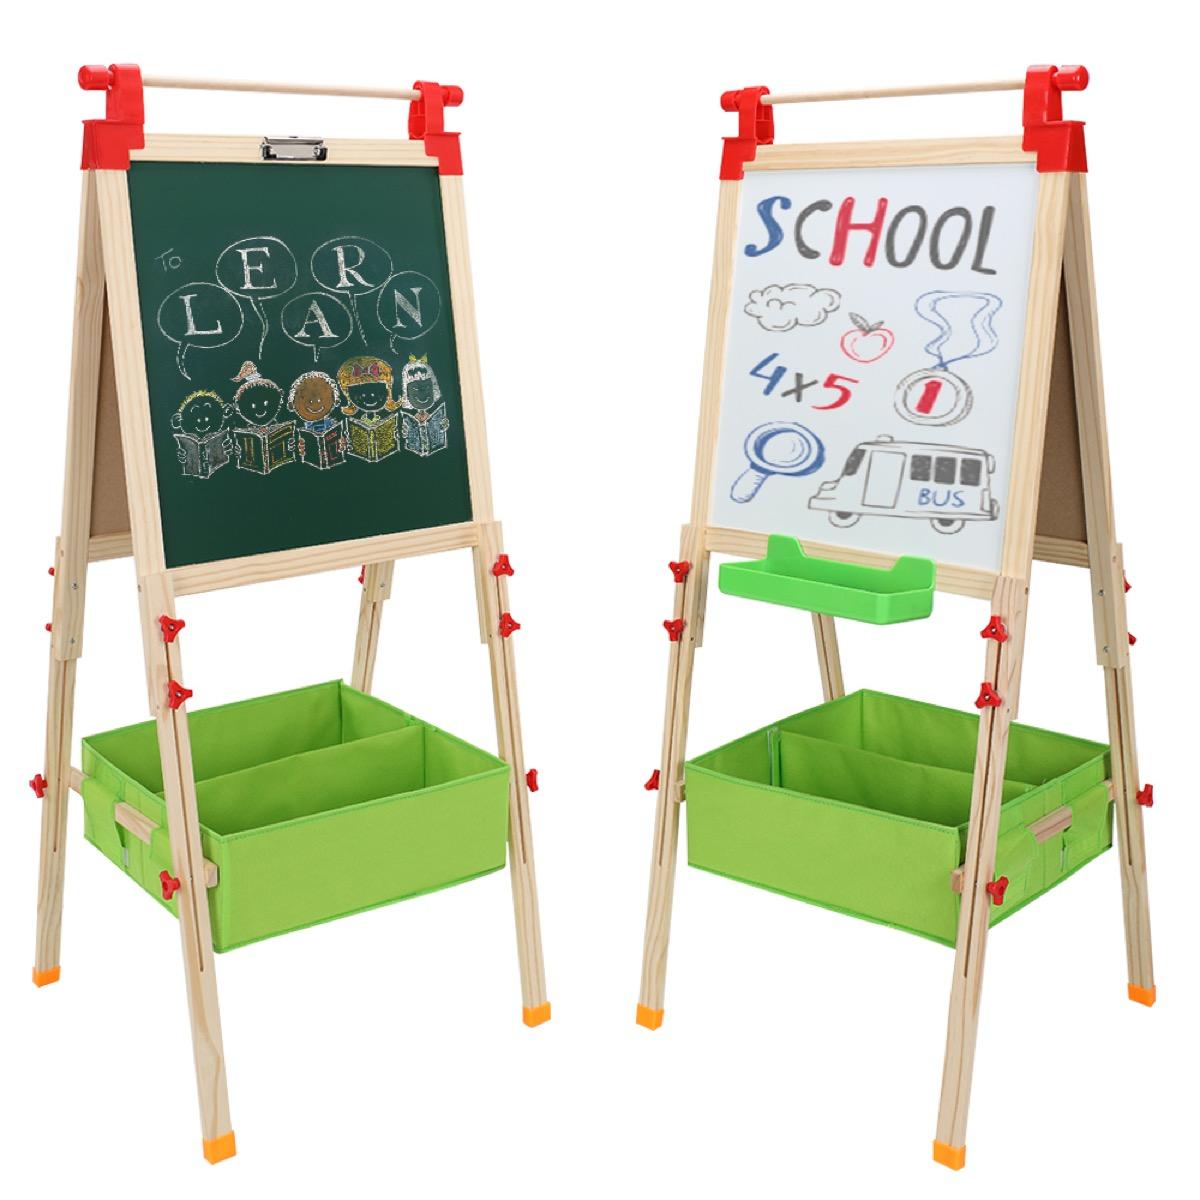 Double sided school easel